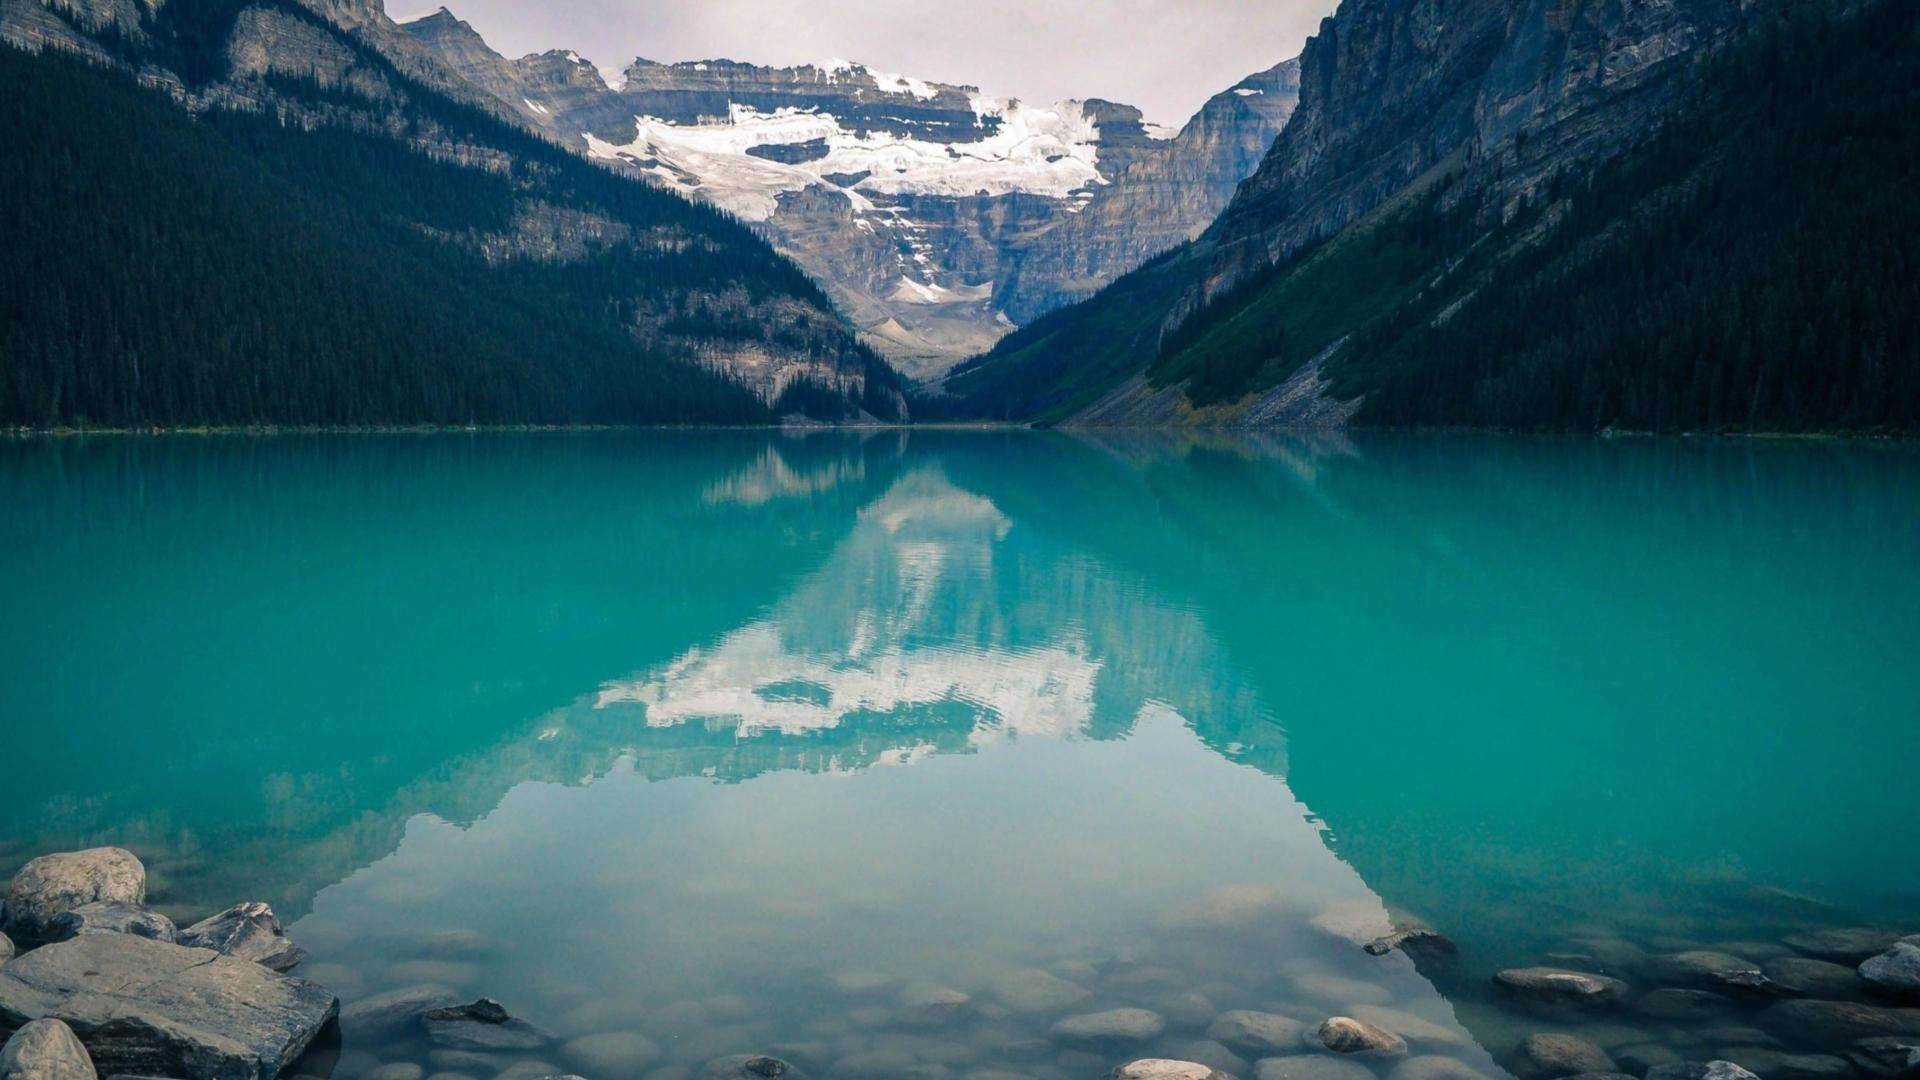 canada lake louise imac mac wallpapers inch